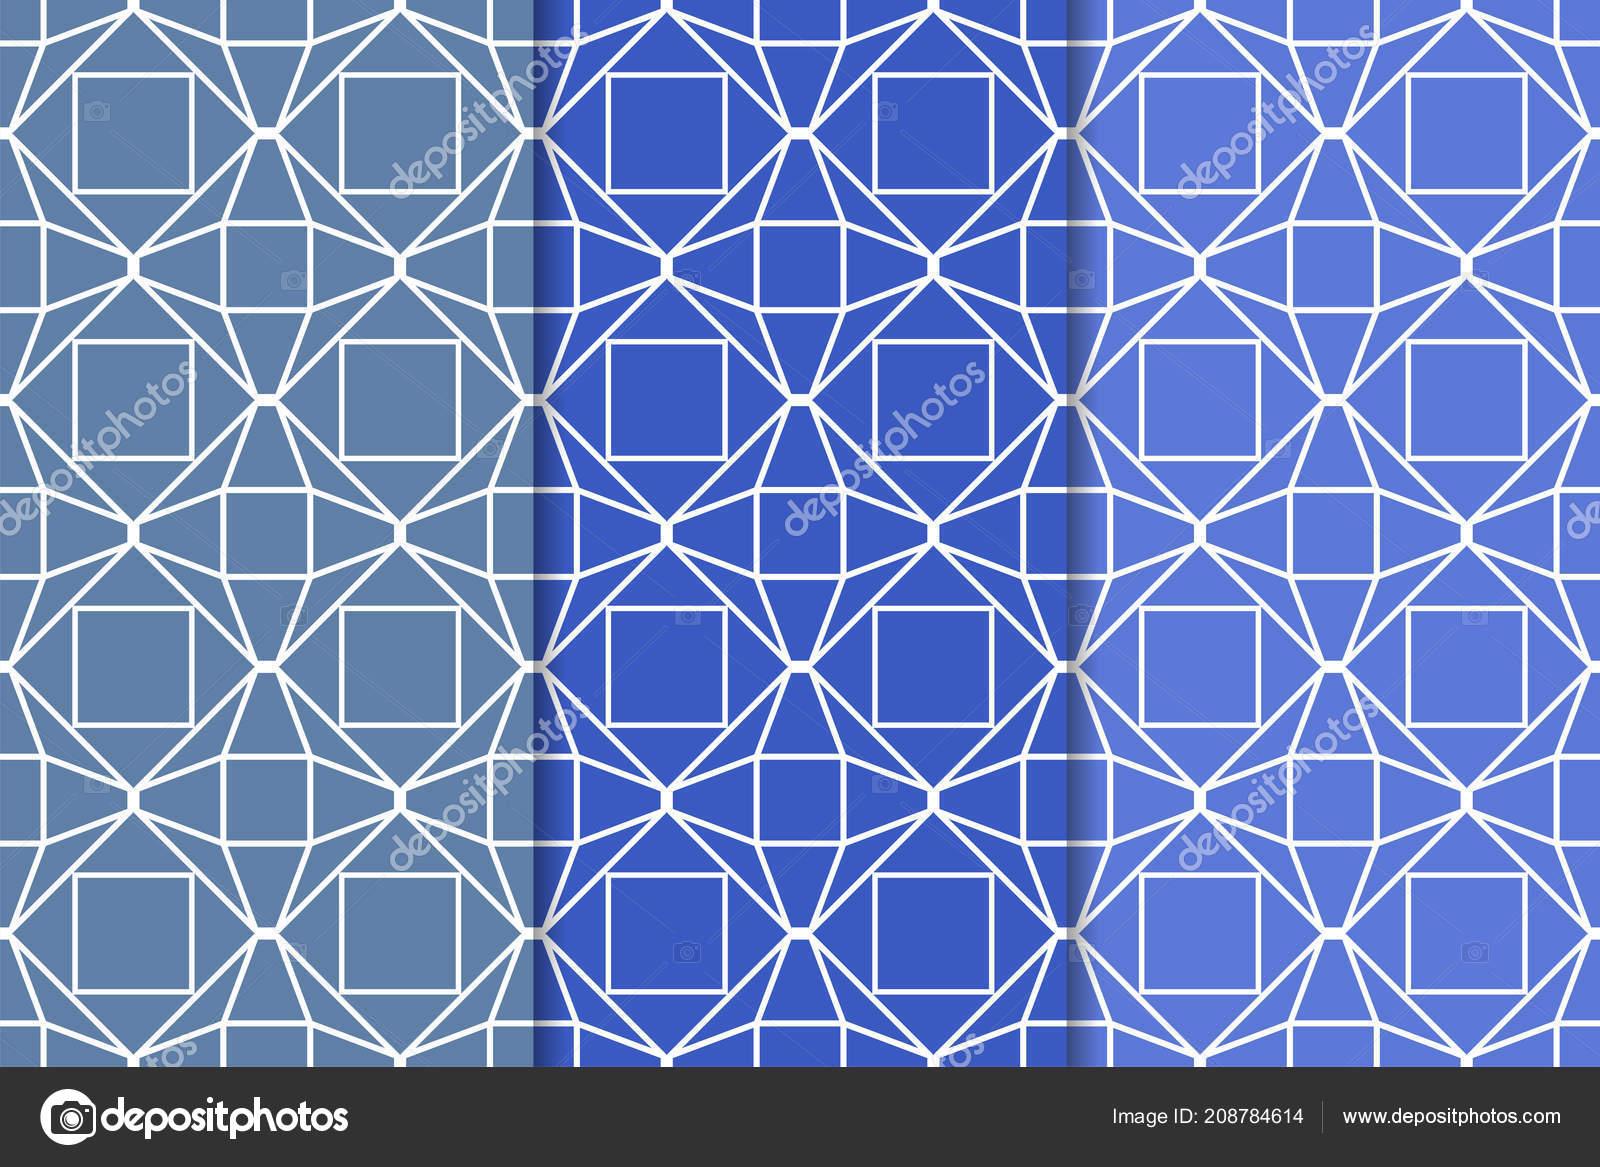 Web テキスタイルや壁紙のため垂直のシームレス パターンのブルーの